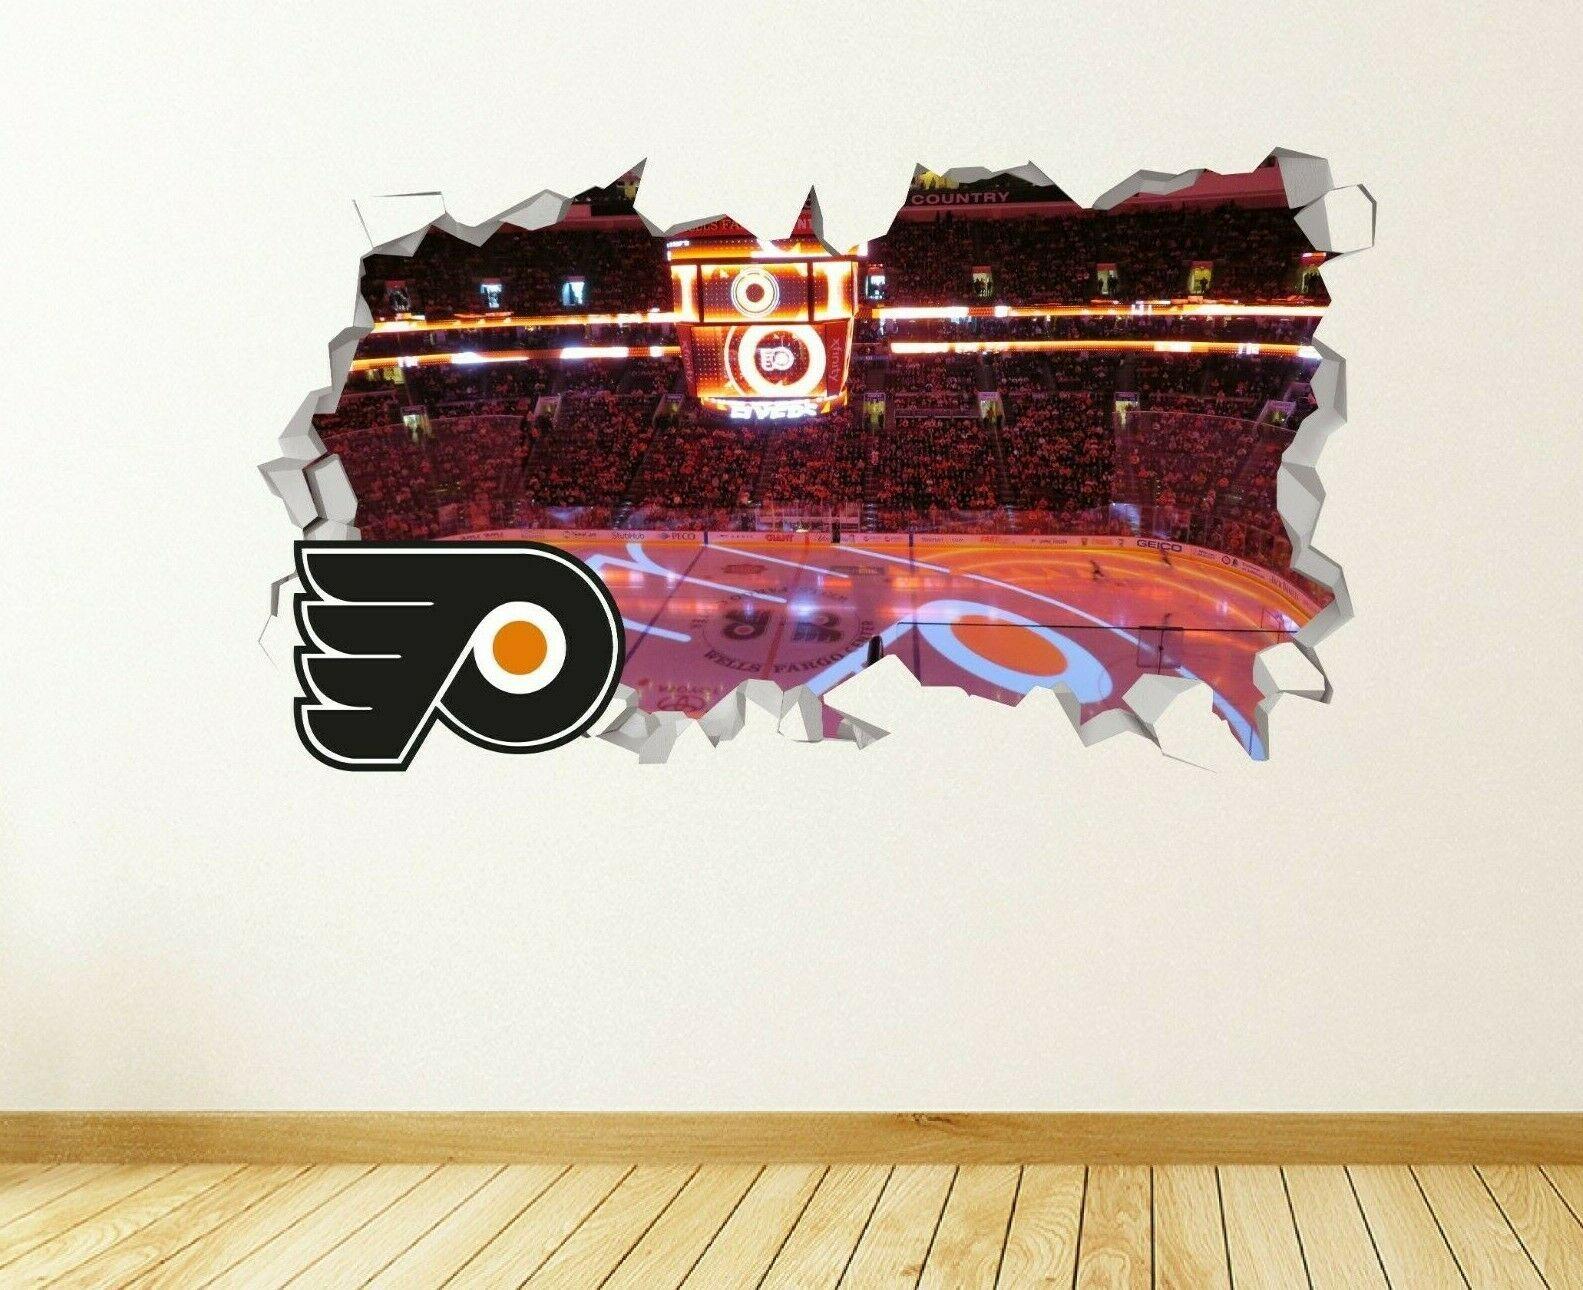 Details About Philadelphia Flyers Wall Decal Smashed Nhl Sport 3d Art Sticker Vinyl Js1689 In 2020 Sticker Art 3d Art Family Tree Wall Sticker